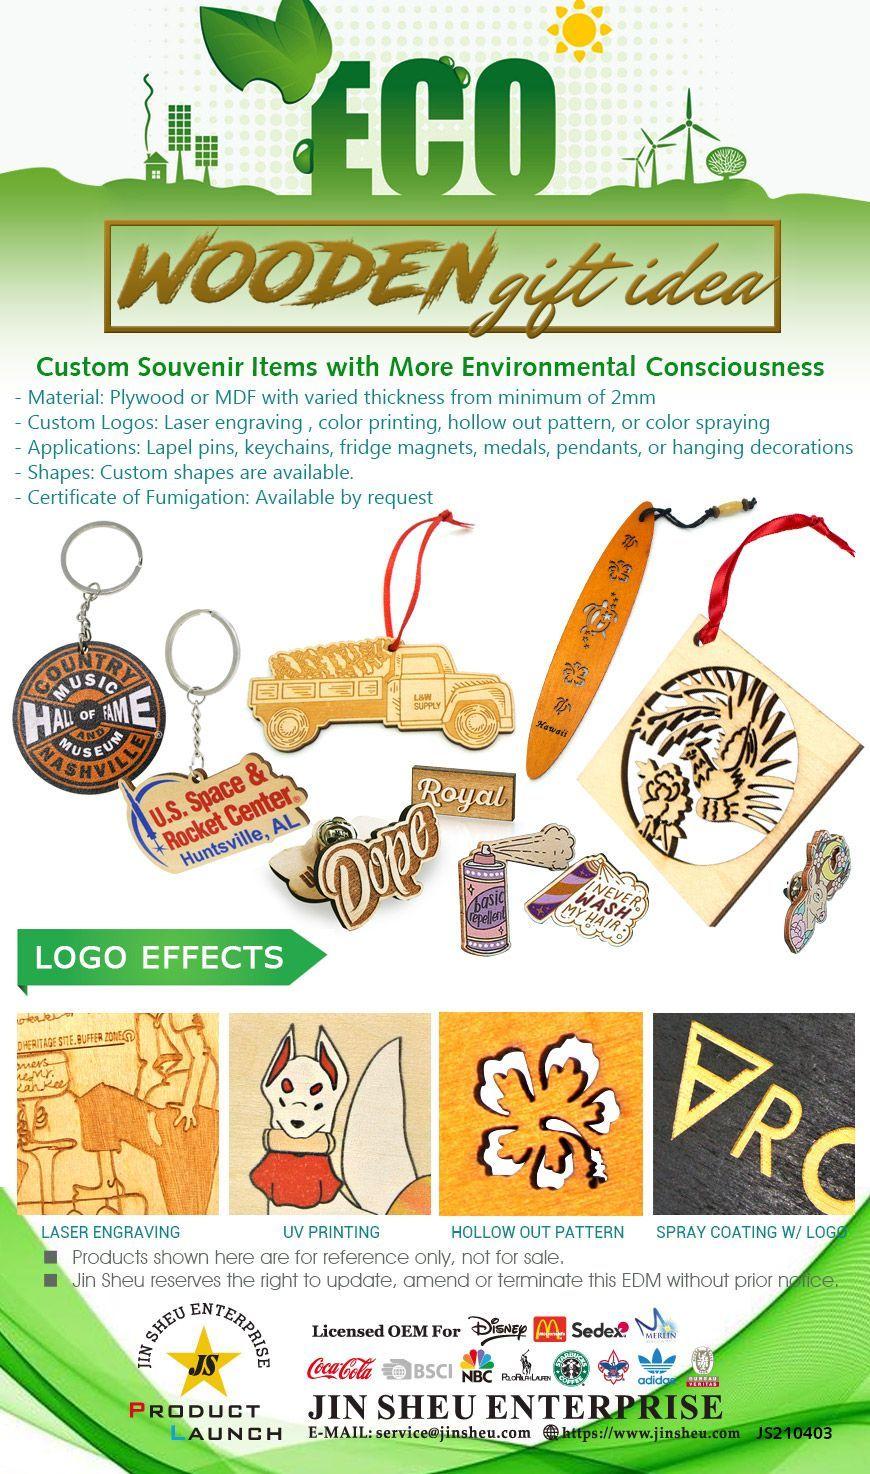 Custom Made Wooden Souvenirs